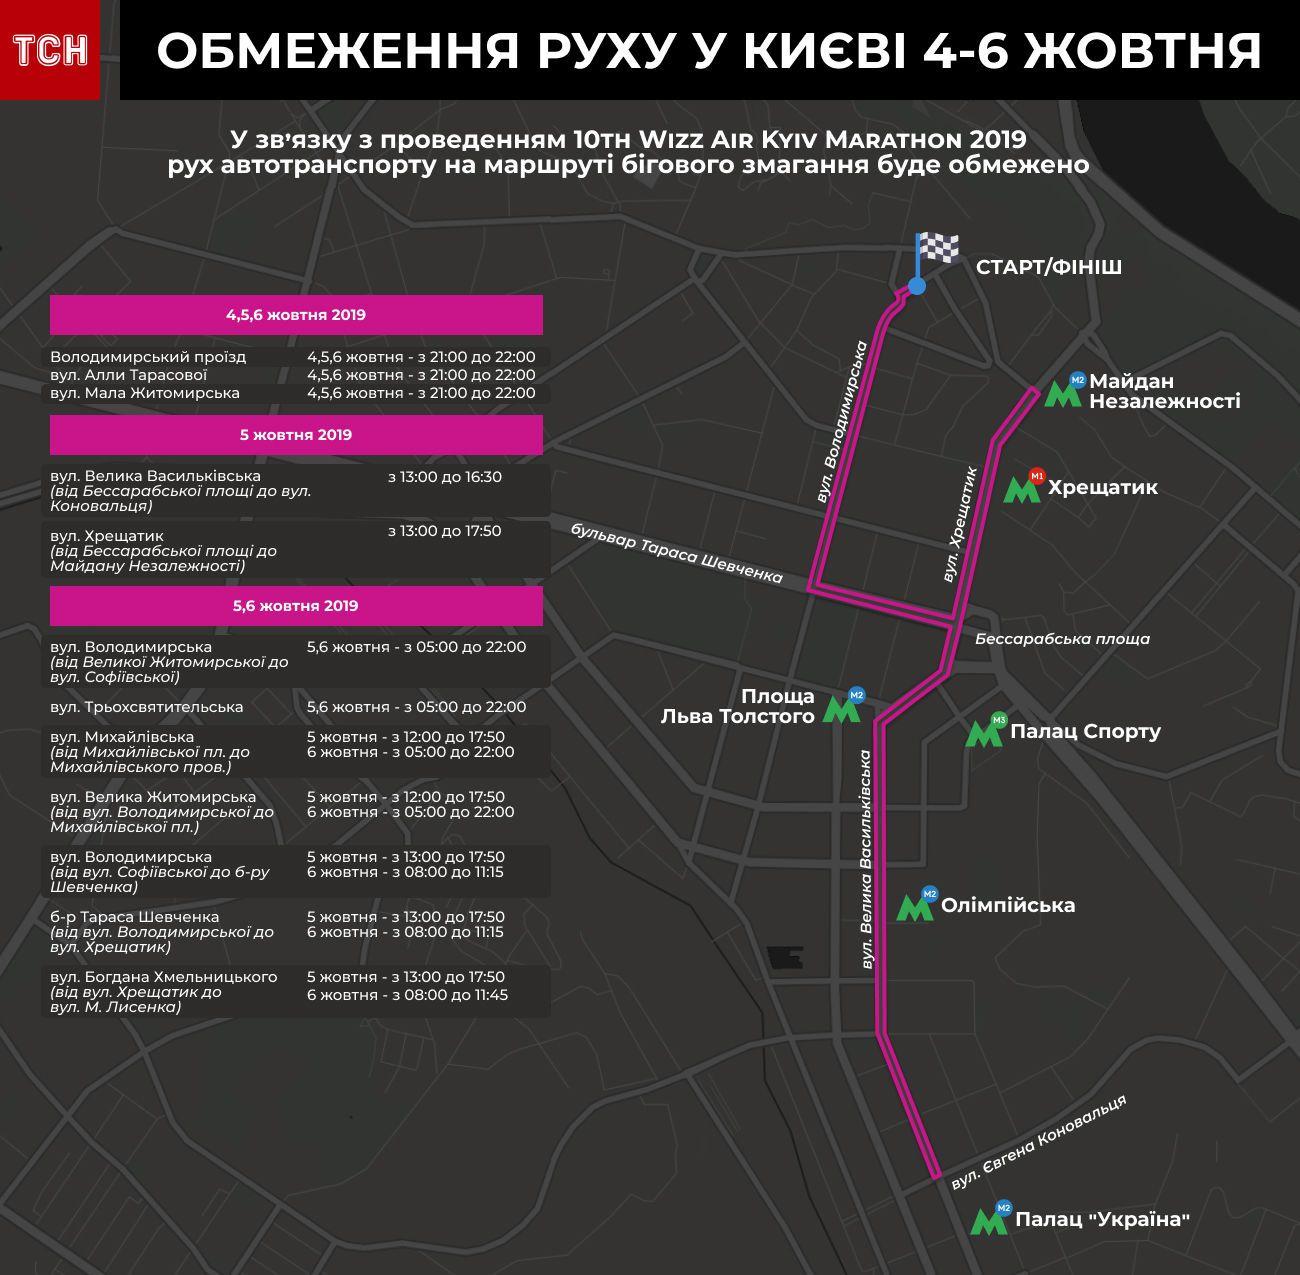 Обмеження руху в Києва 4-6 жовтня_1